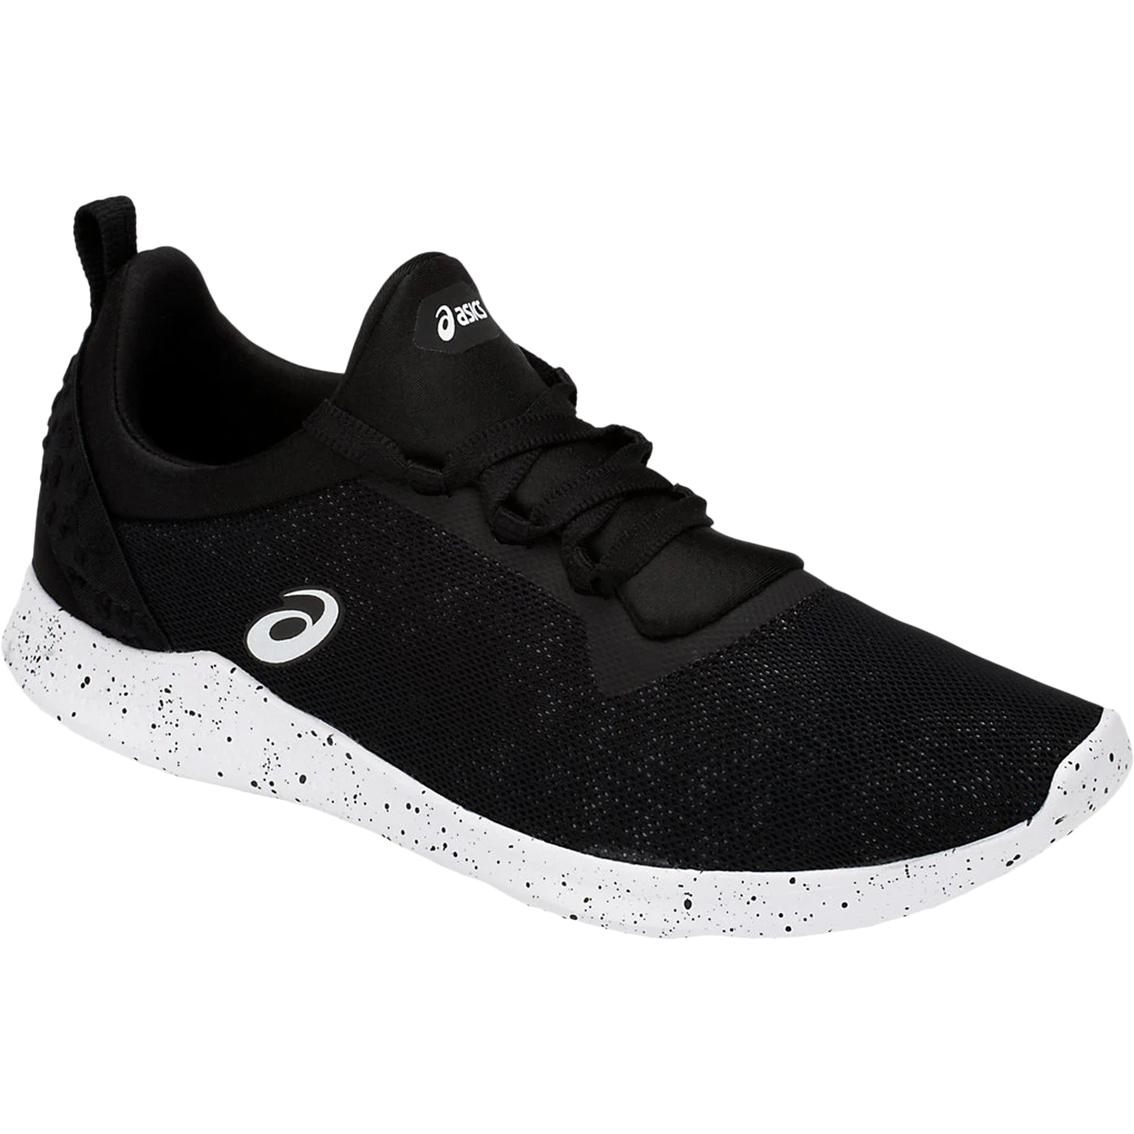 f36ed75f Asics Women's Gel-fit Sana 4 Training Shoes | Running ...